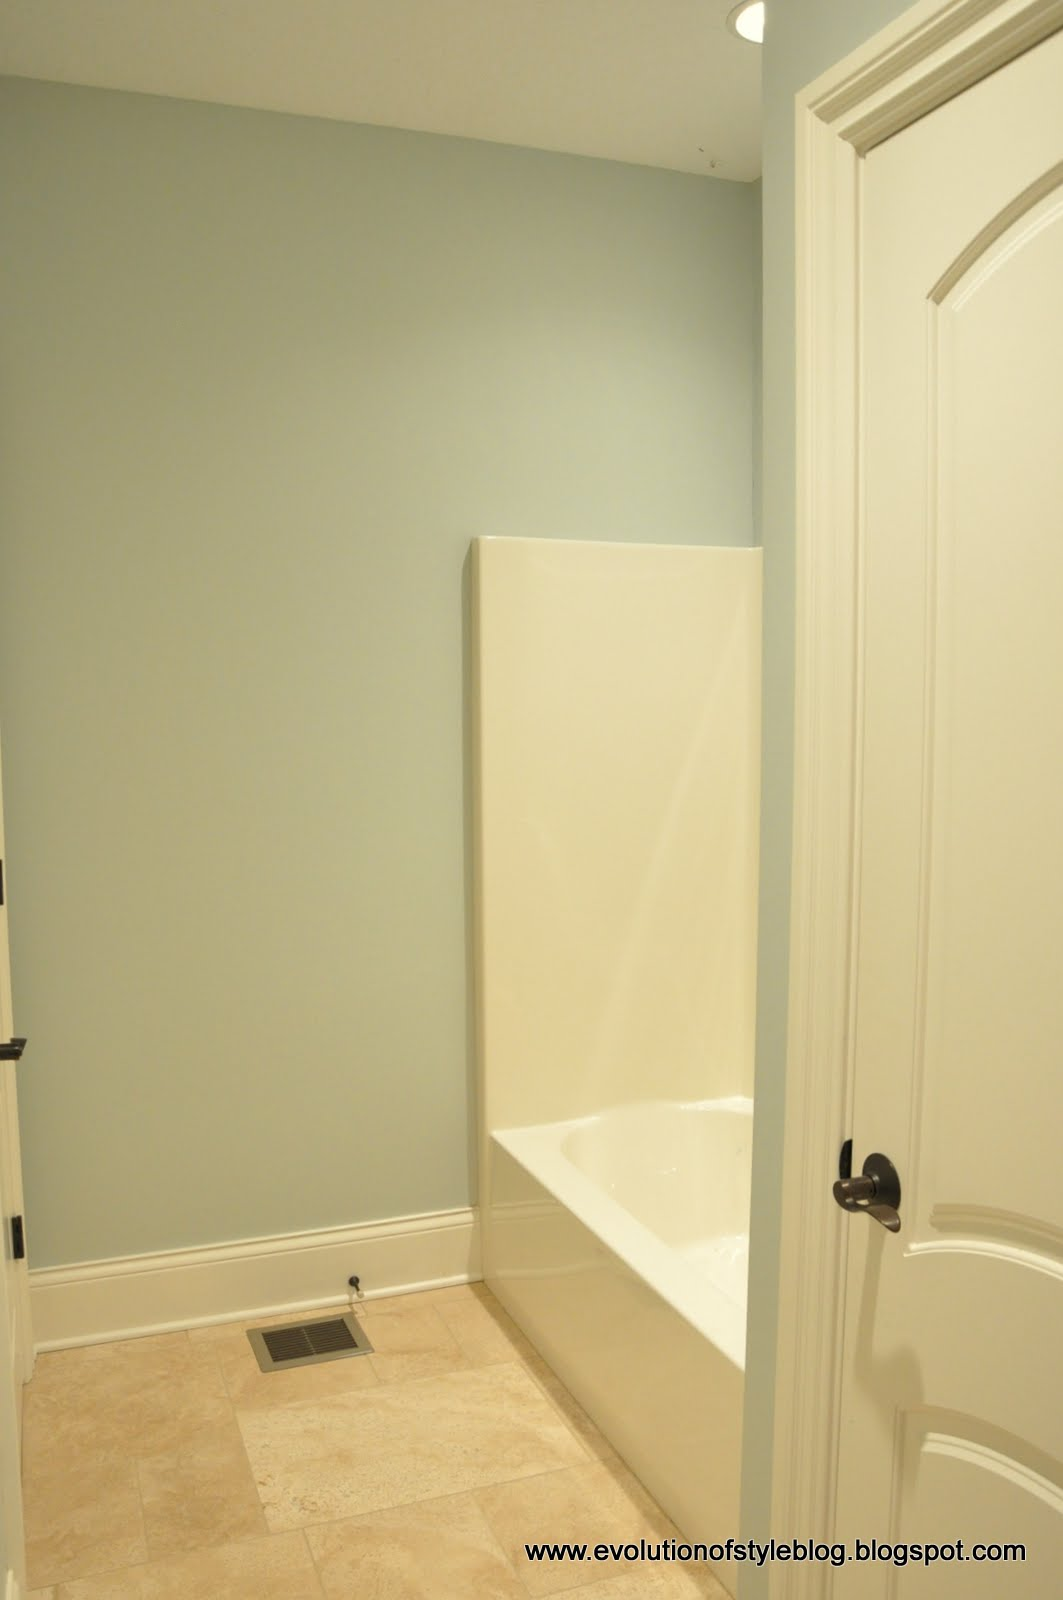 Jack & Jill Bathroom - Makeover in Progress - Evolution of Style